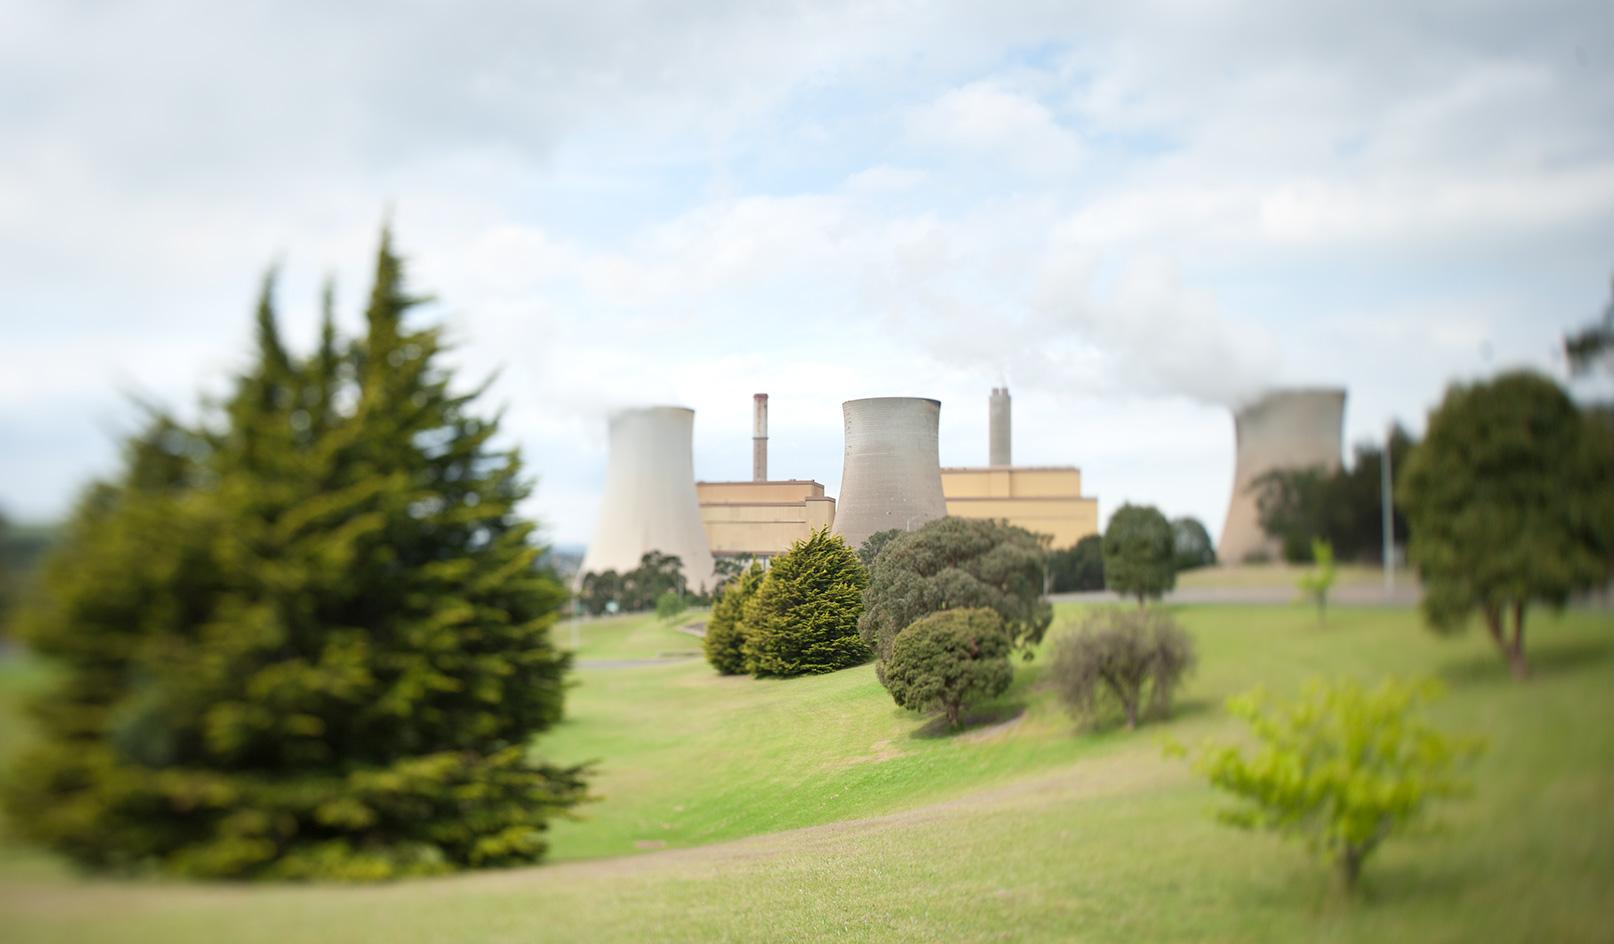 <div>Industrial</div><div> <a href='https://nedmeldrum.com.au/project/yallourn-power-station/'>View Series</a></div>